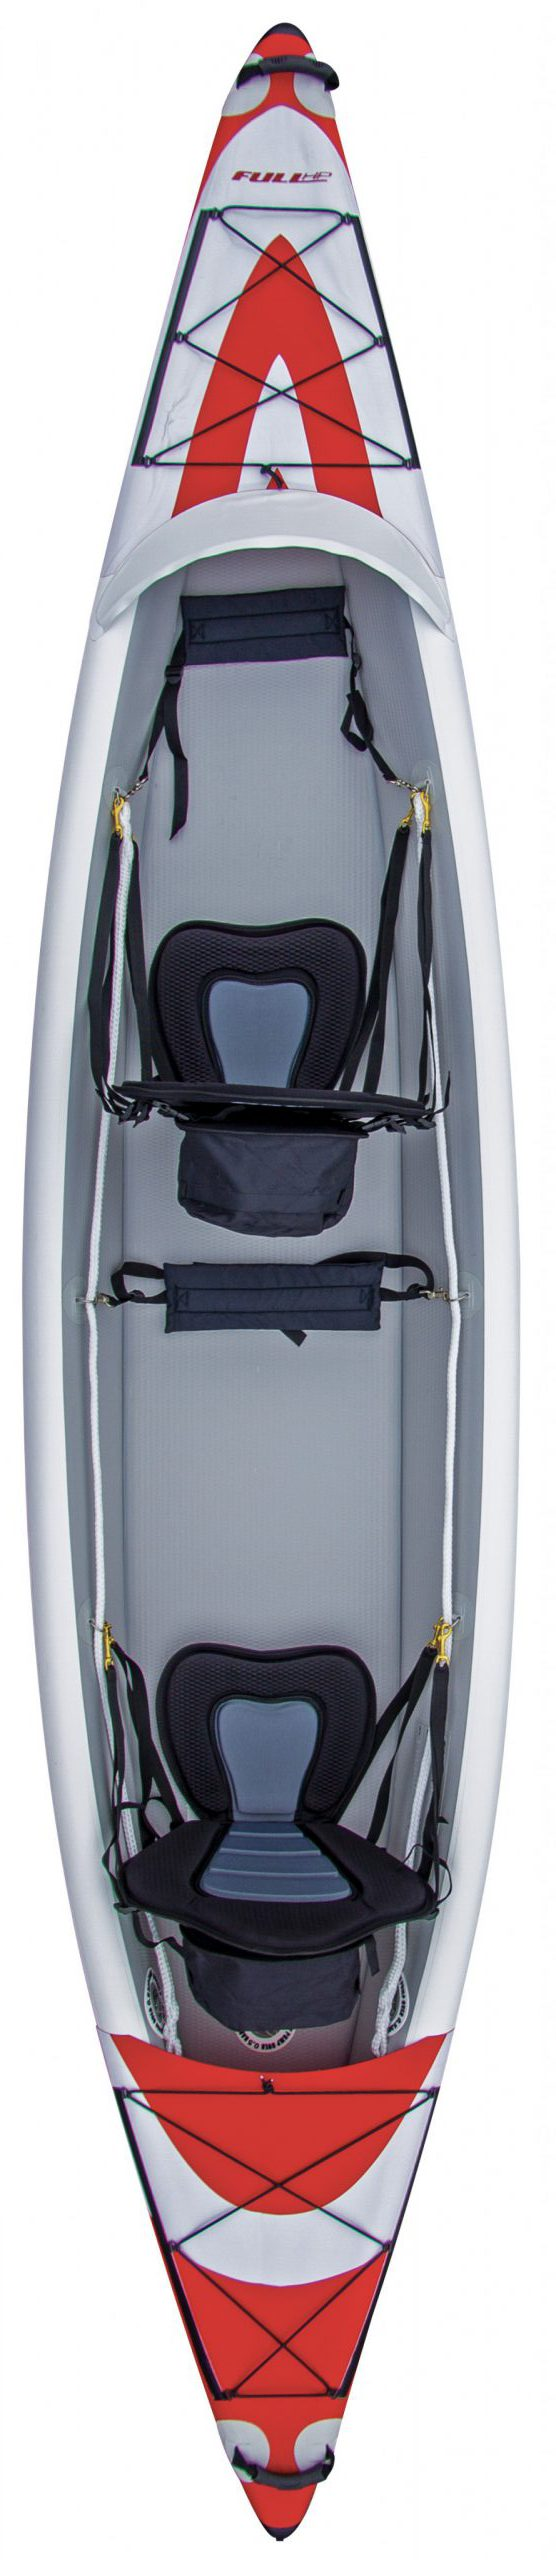 BIC inflatable KAJAK FULL HP 2